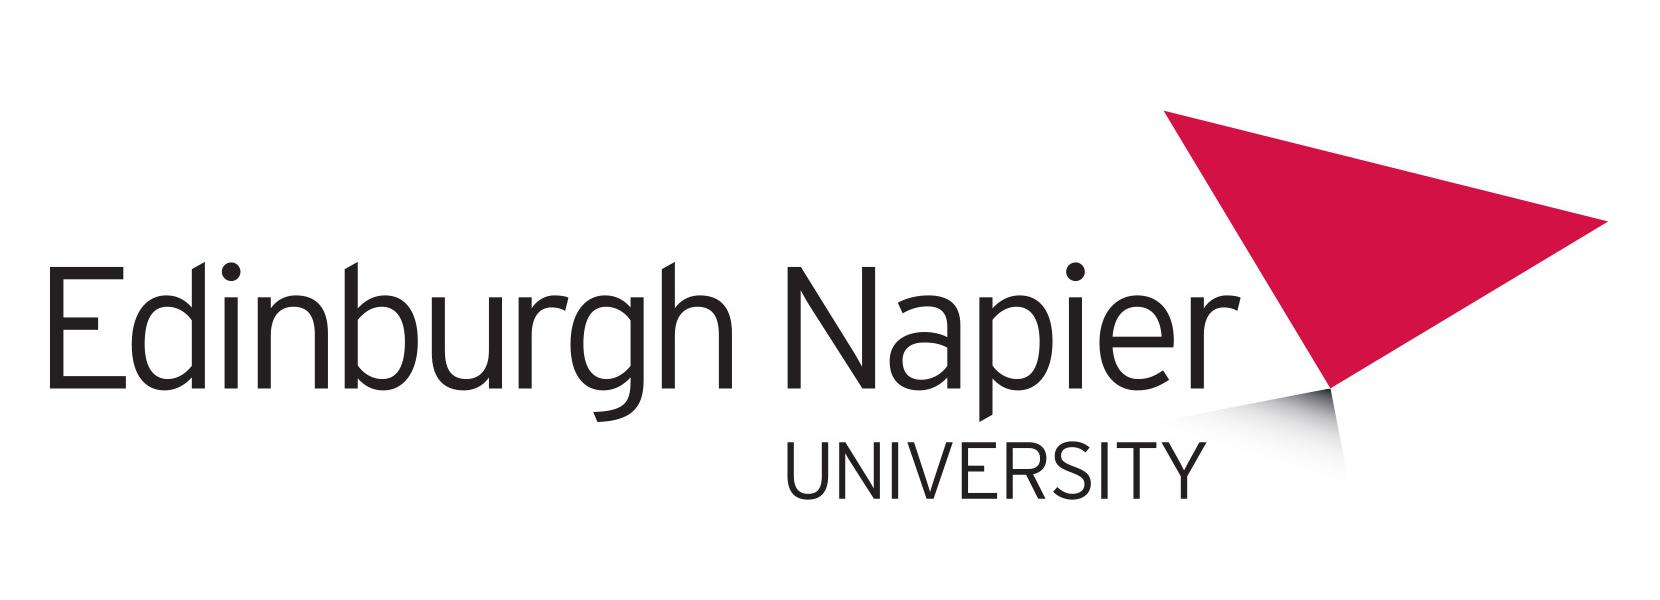 Edinburg-Napier-logo.jpg